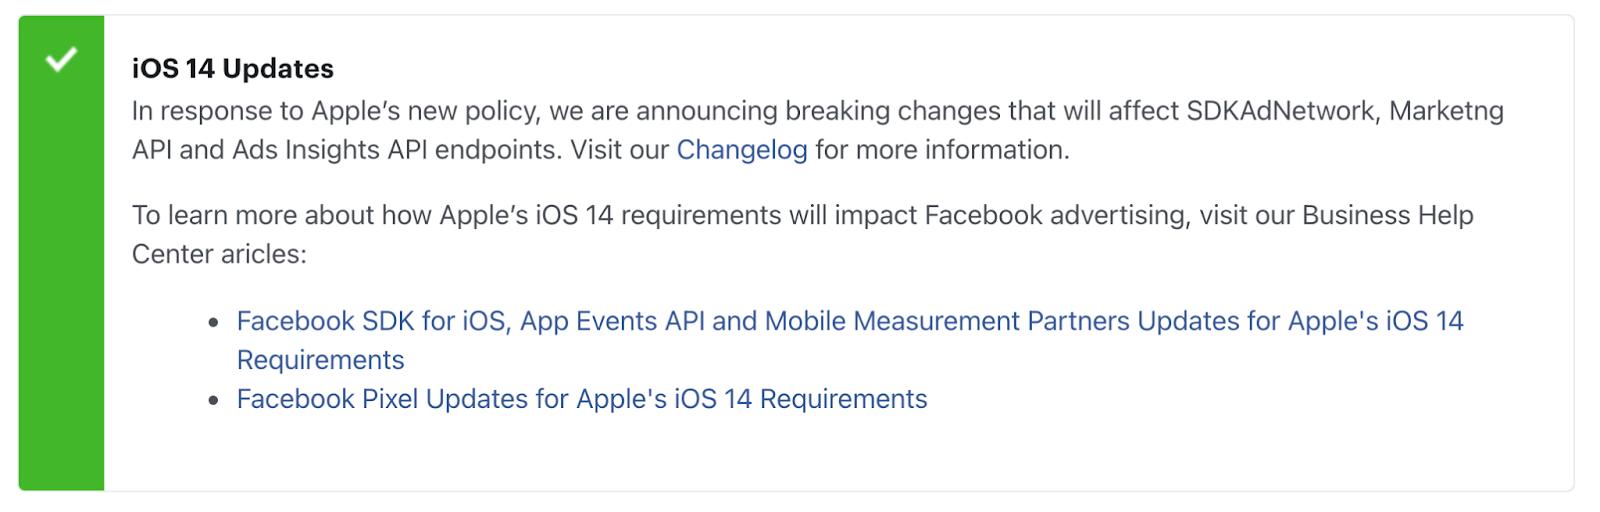 iOS 14 impacts the Facebook Pixel